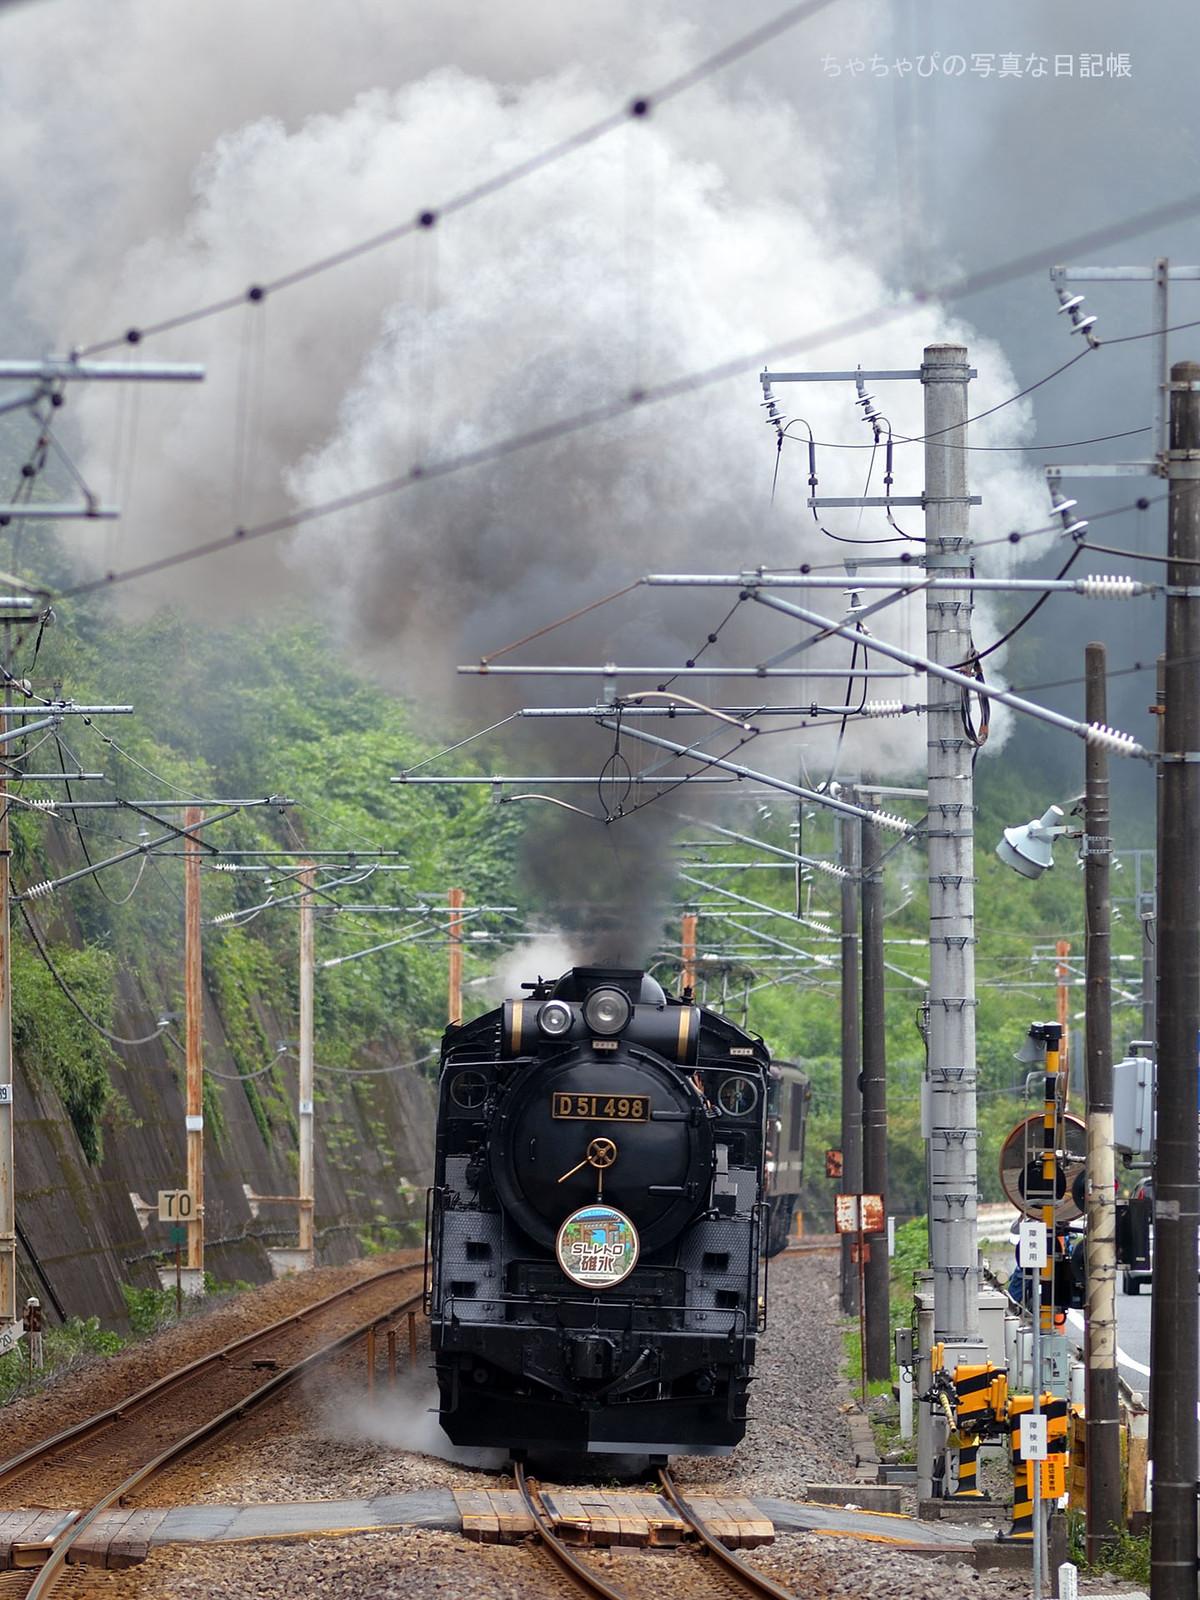 JR東日本 信越本線 西松井田駅~横川駅 快速SLレトロ碓氷